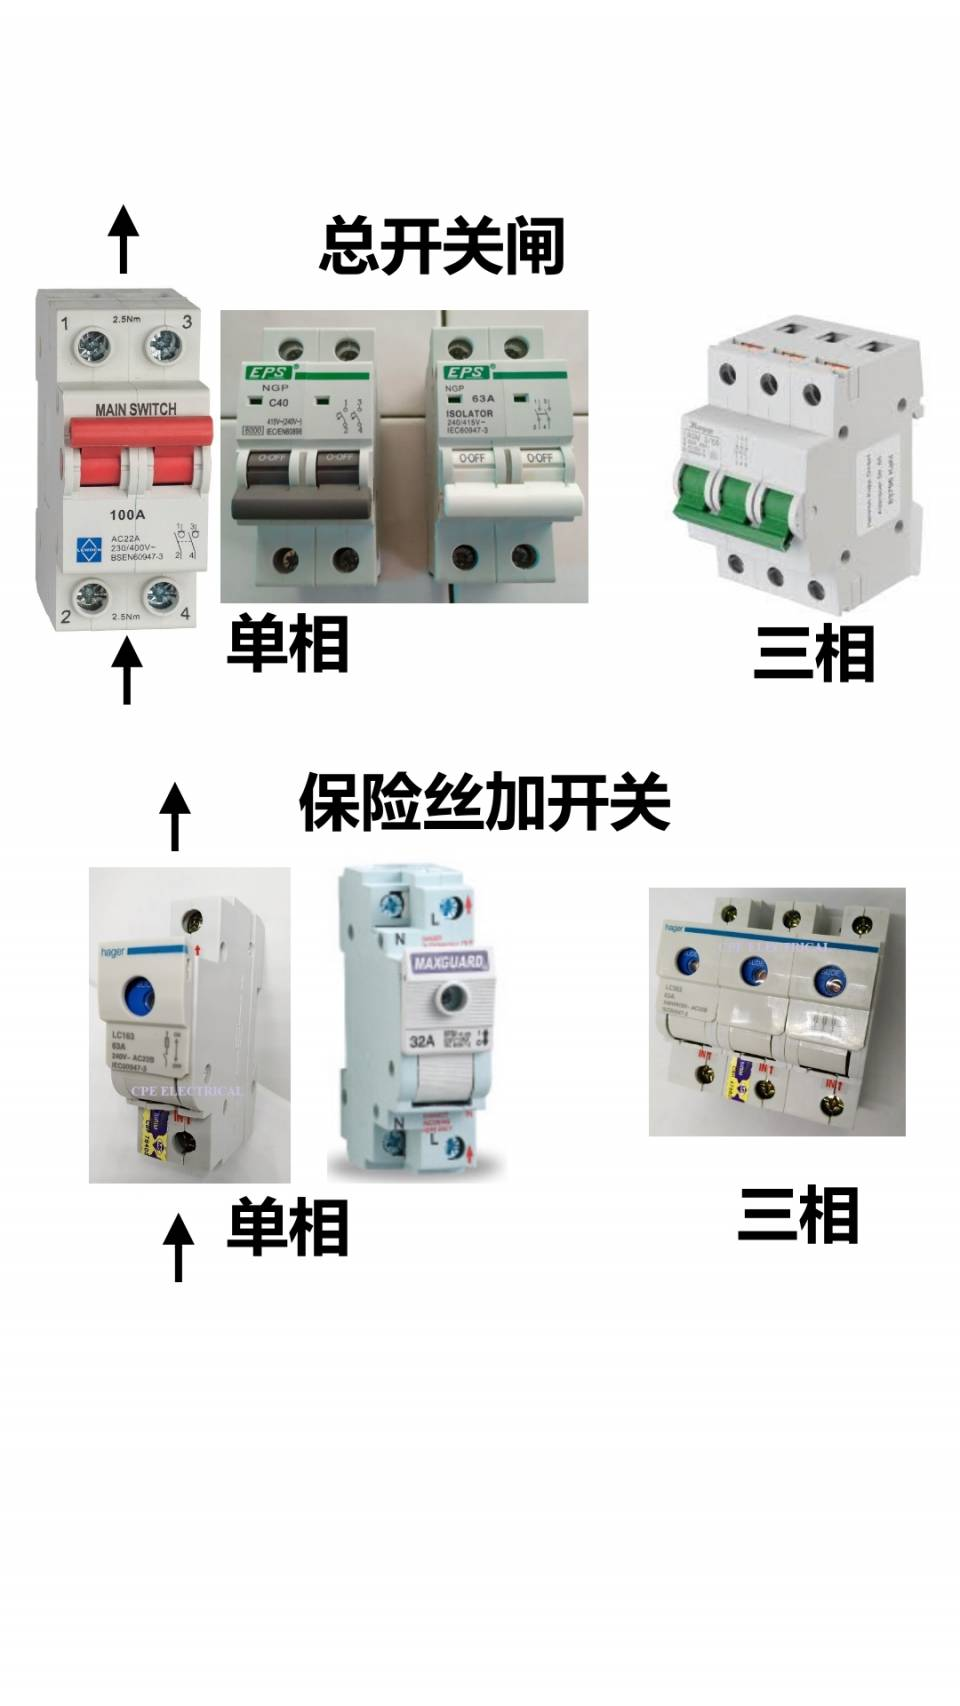 main switch.jpg